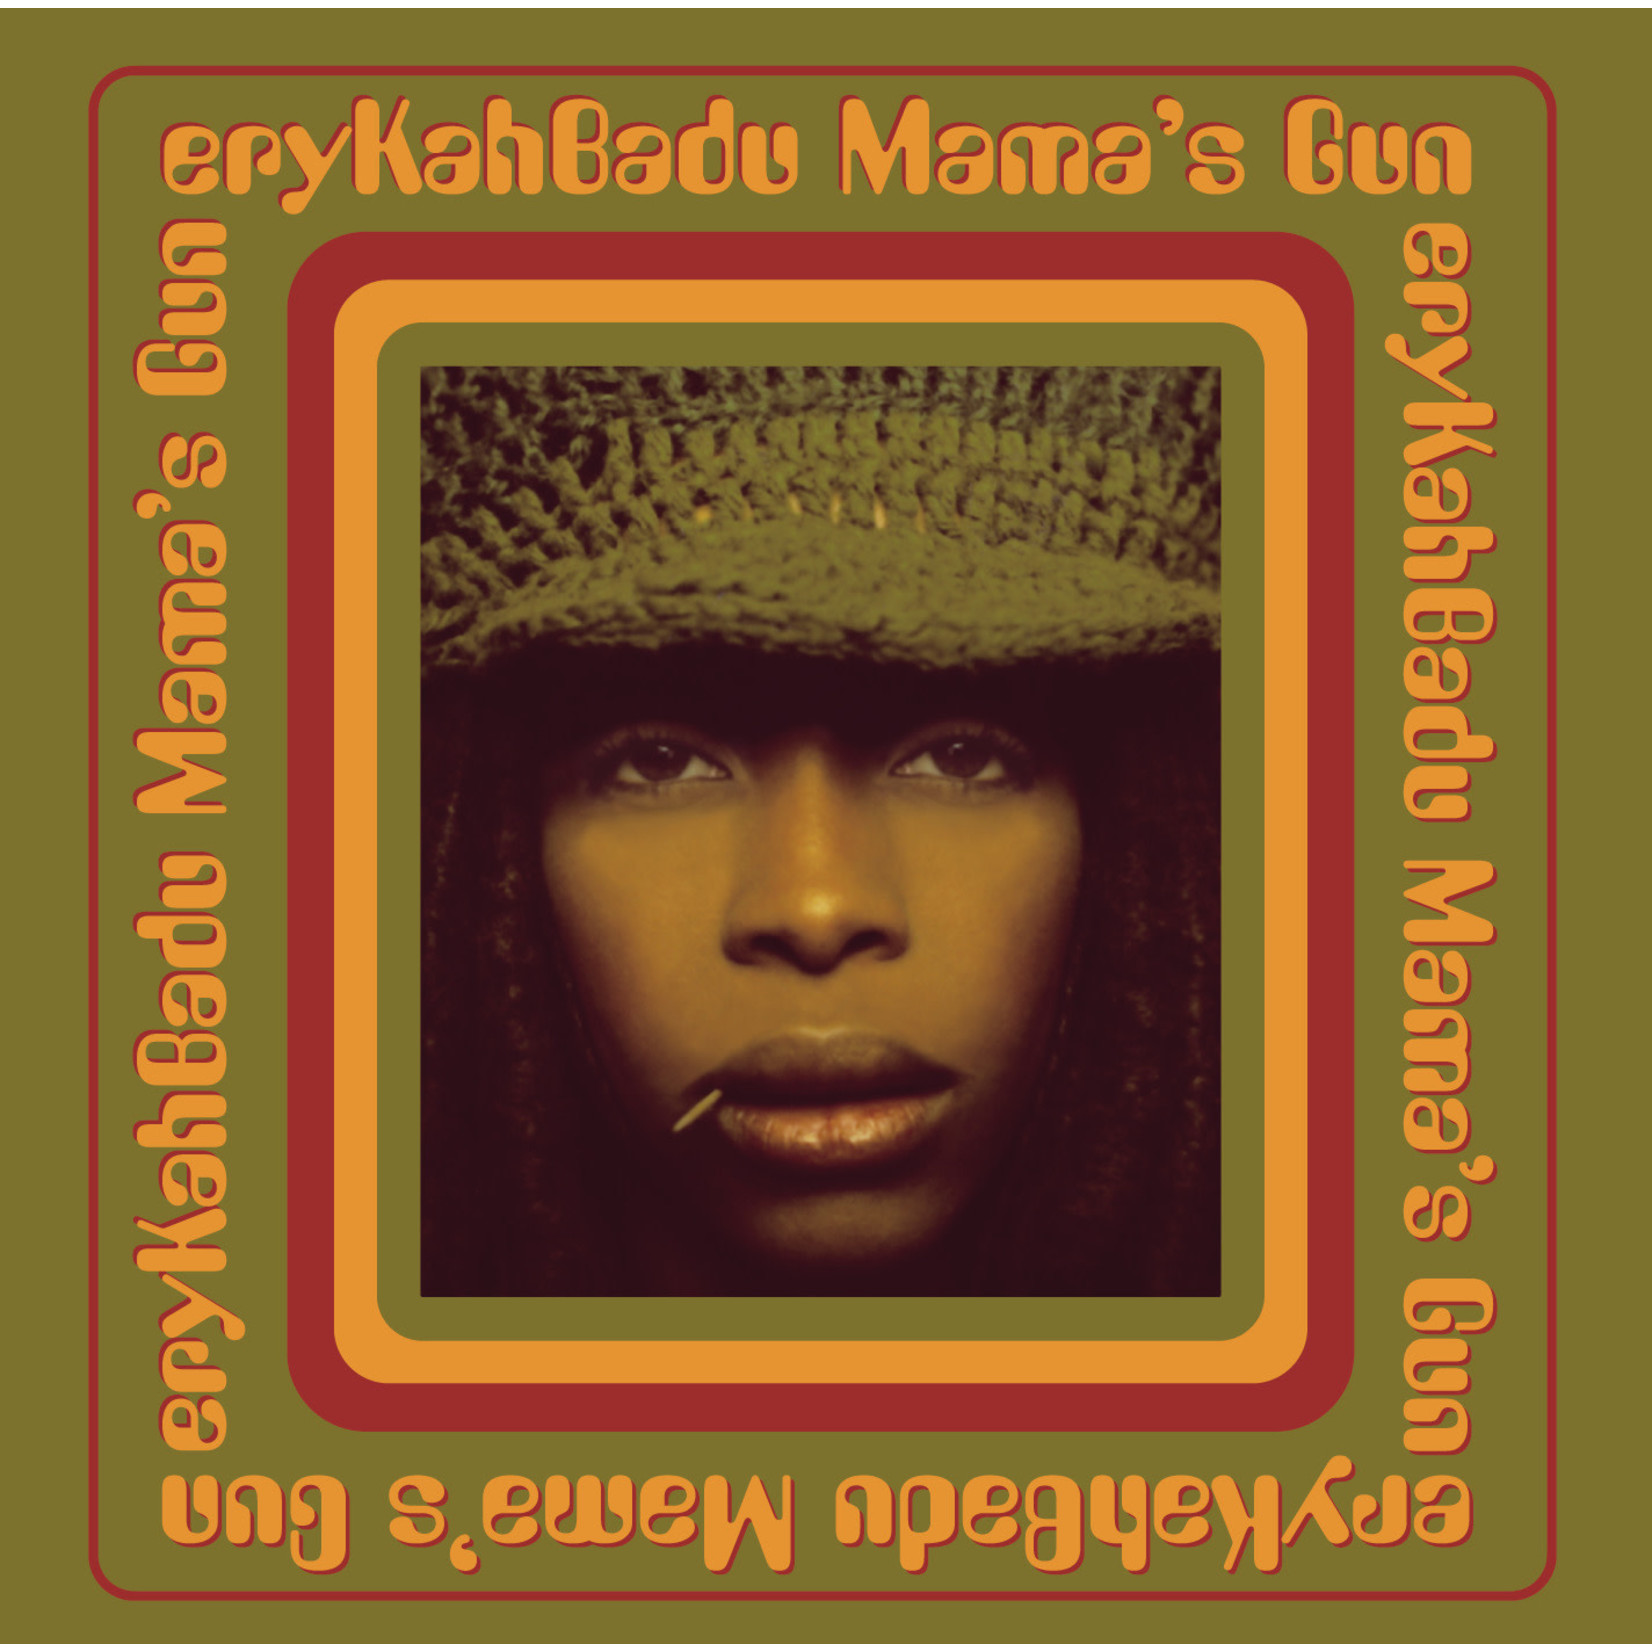 [New] Badu, Erykah: Mama's Gun (2LP)